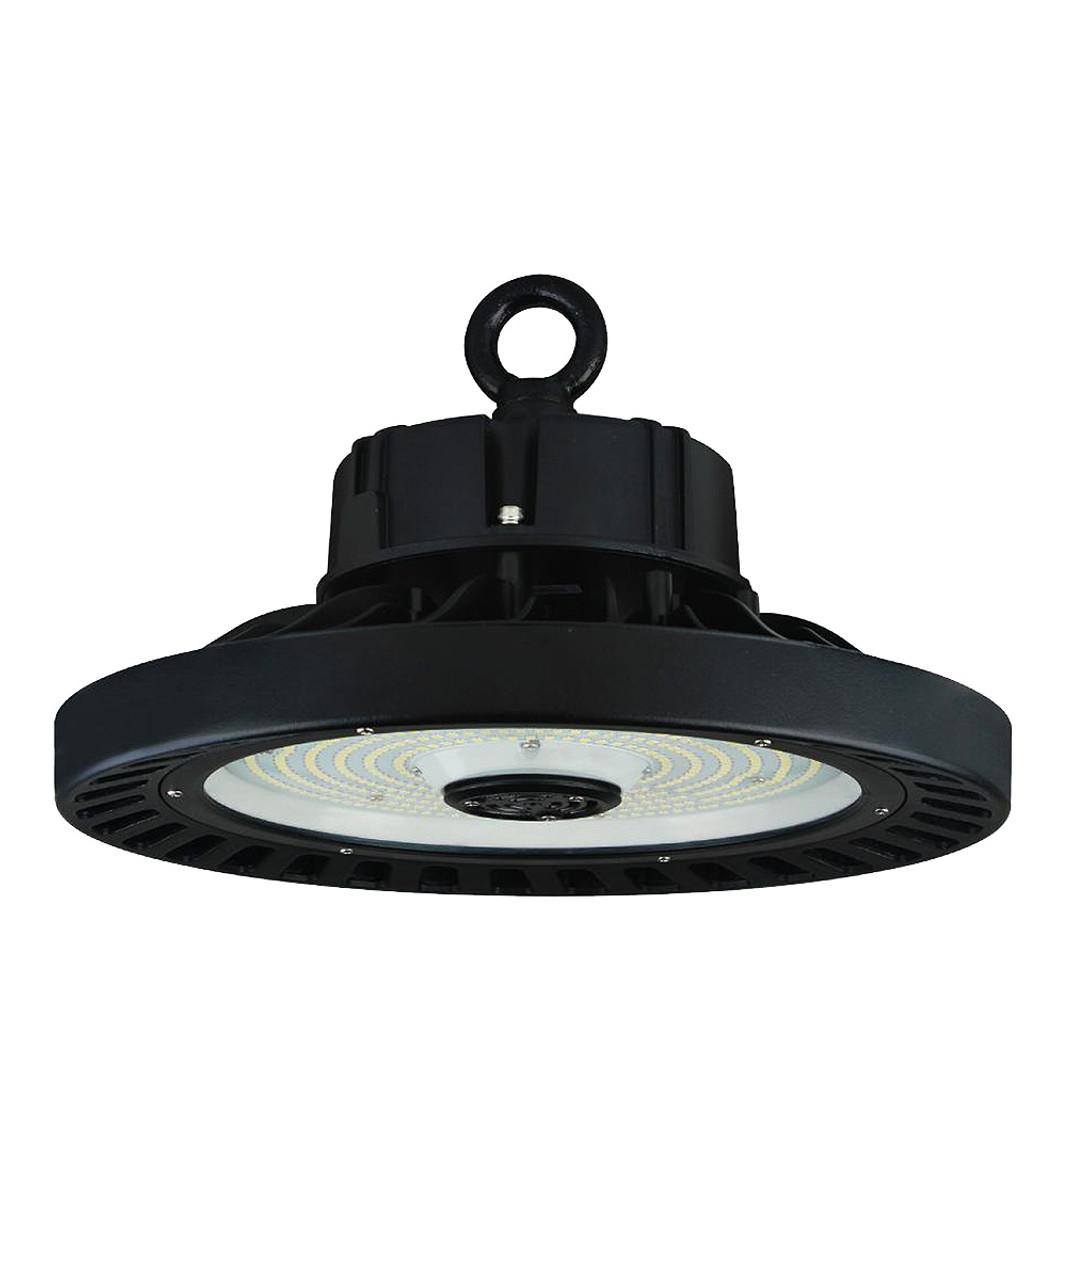 100 Watt LED High Bay